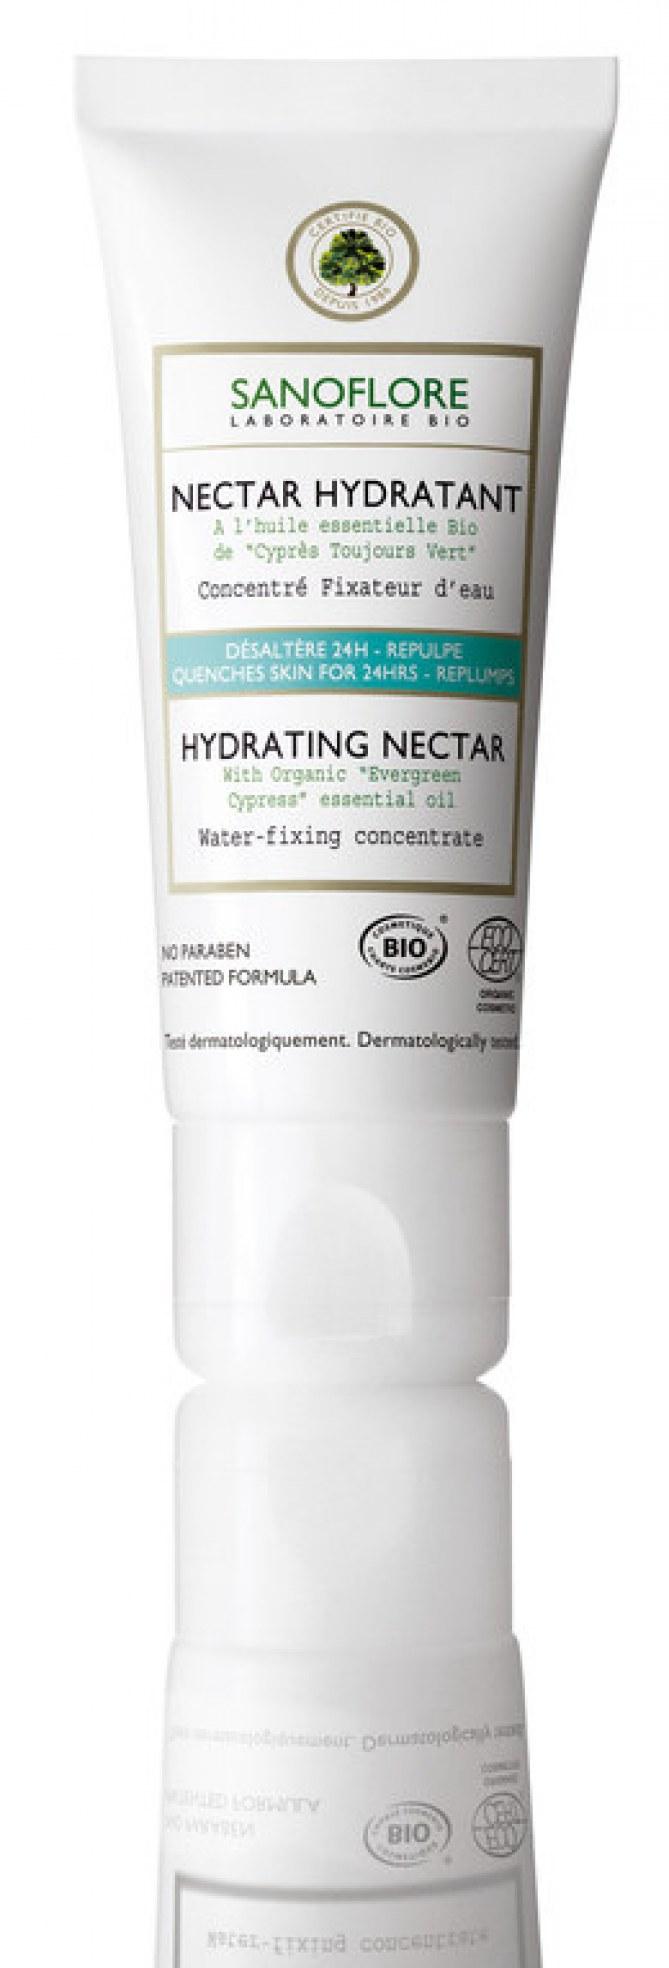 Nectar Hydratant, Sanoflore